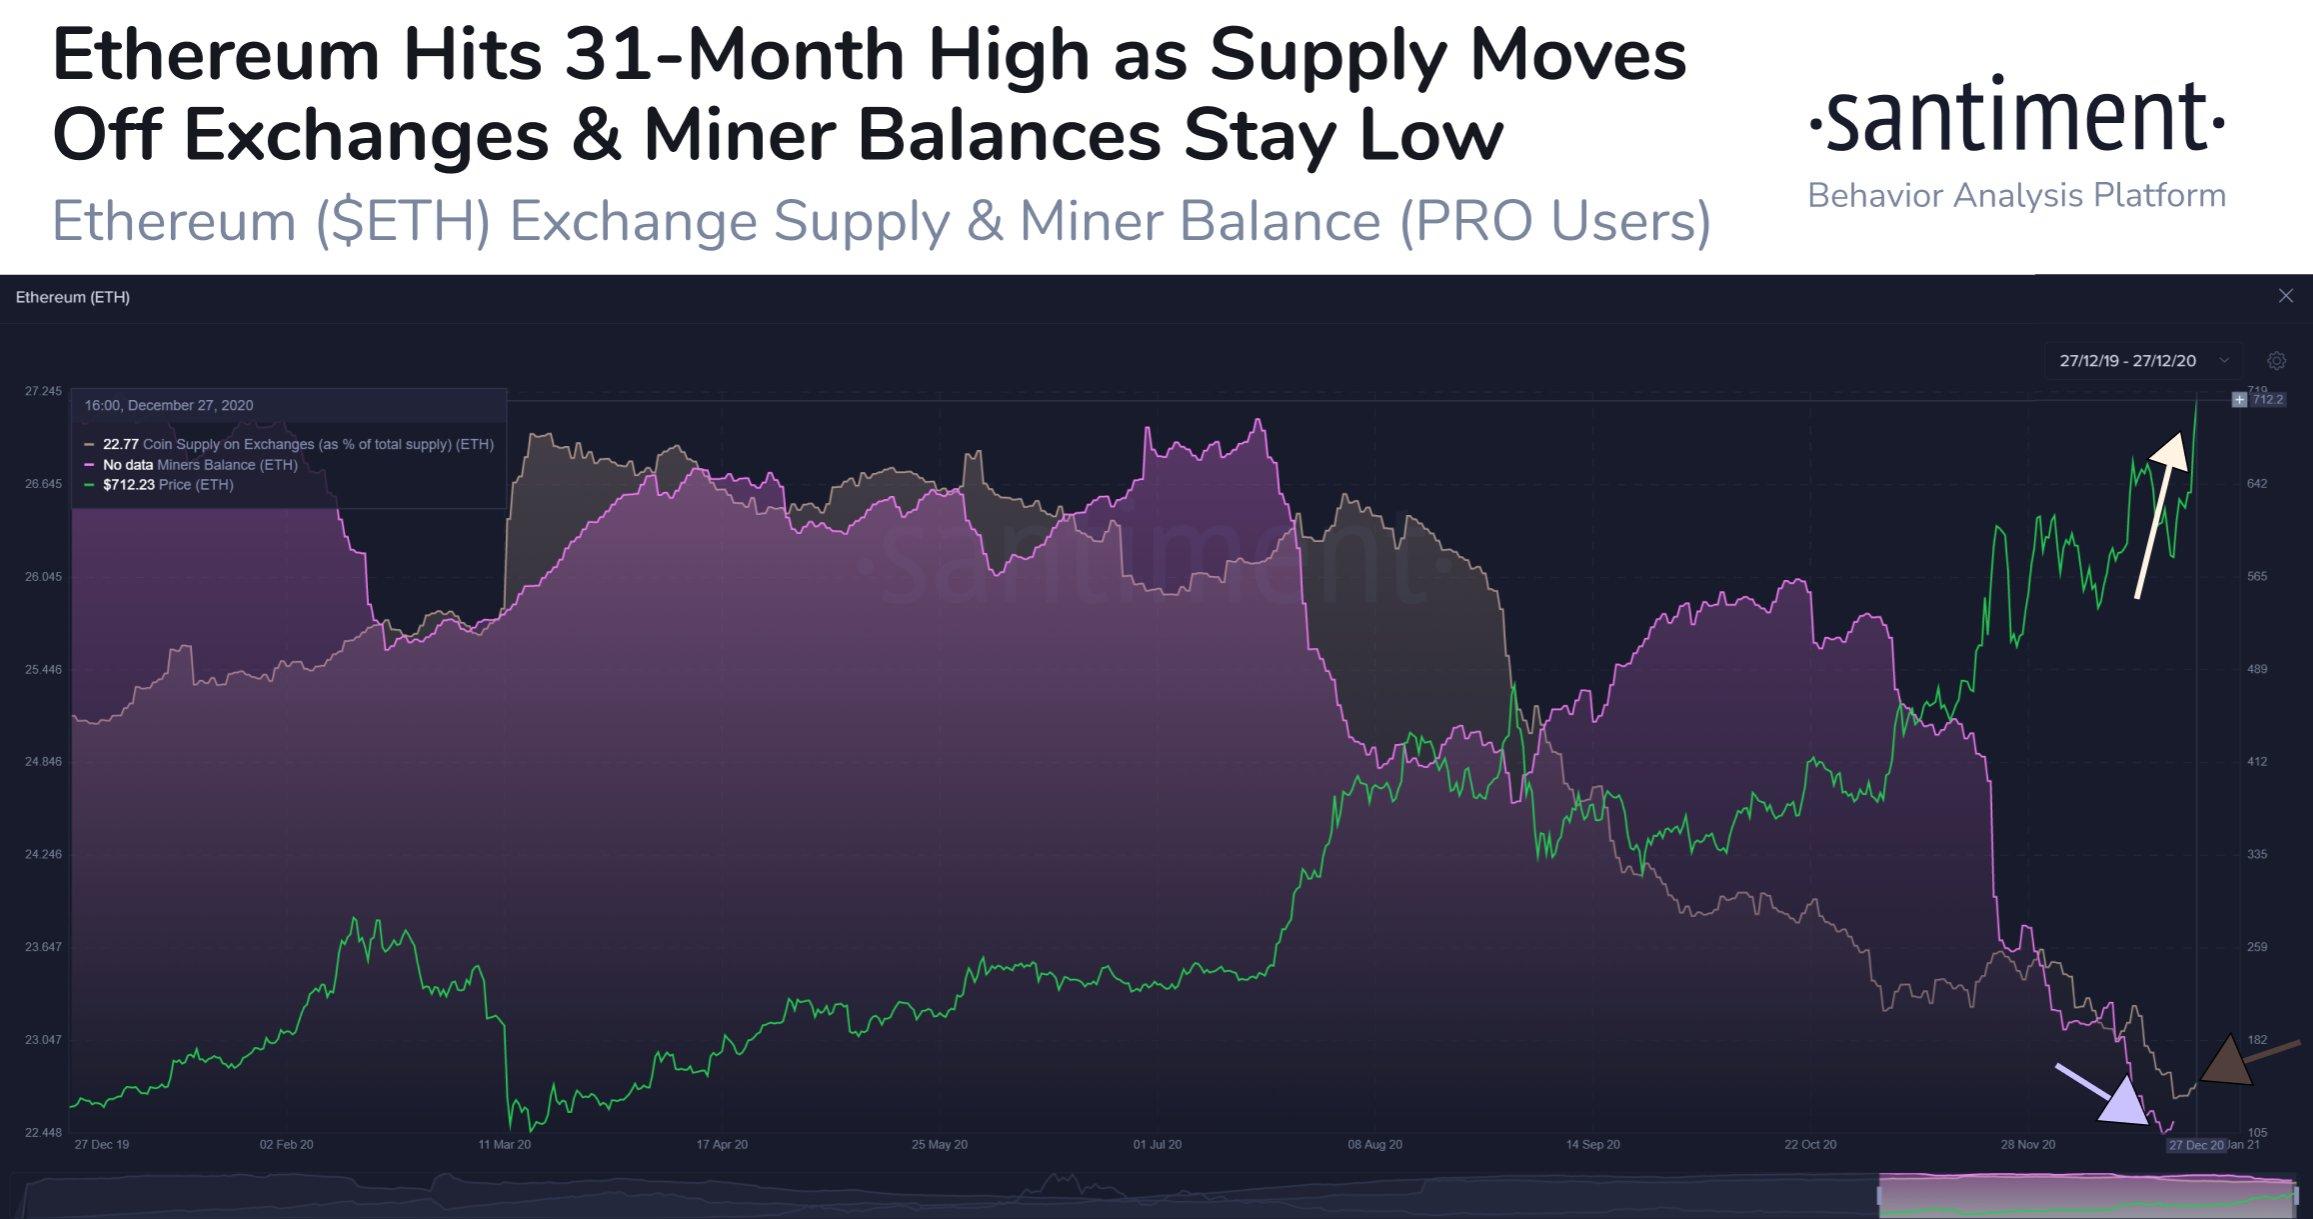 Offerta di Ethereum e saldi dei miner